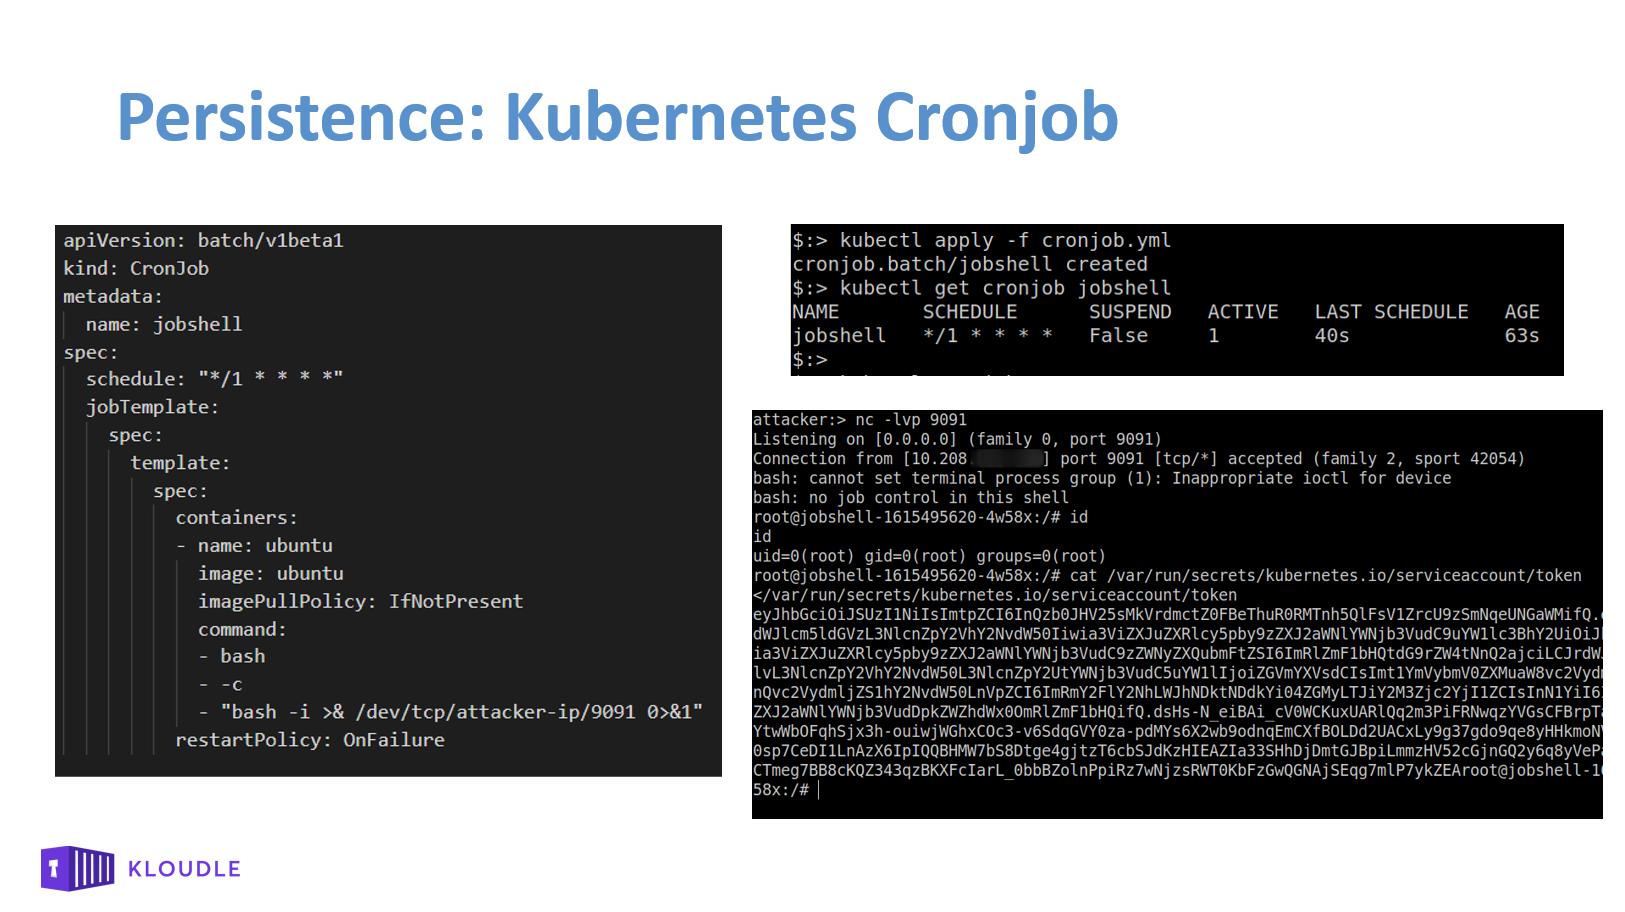 Kubernetes Cronjob that returns a reverse shell